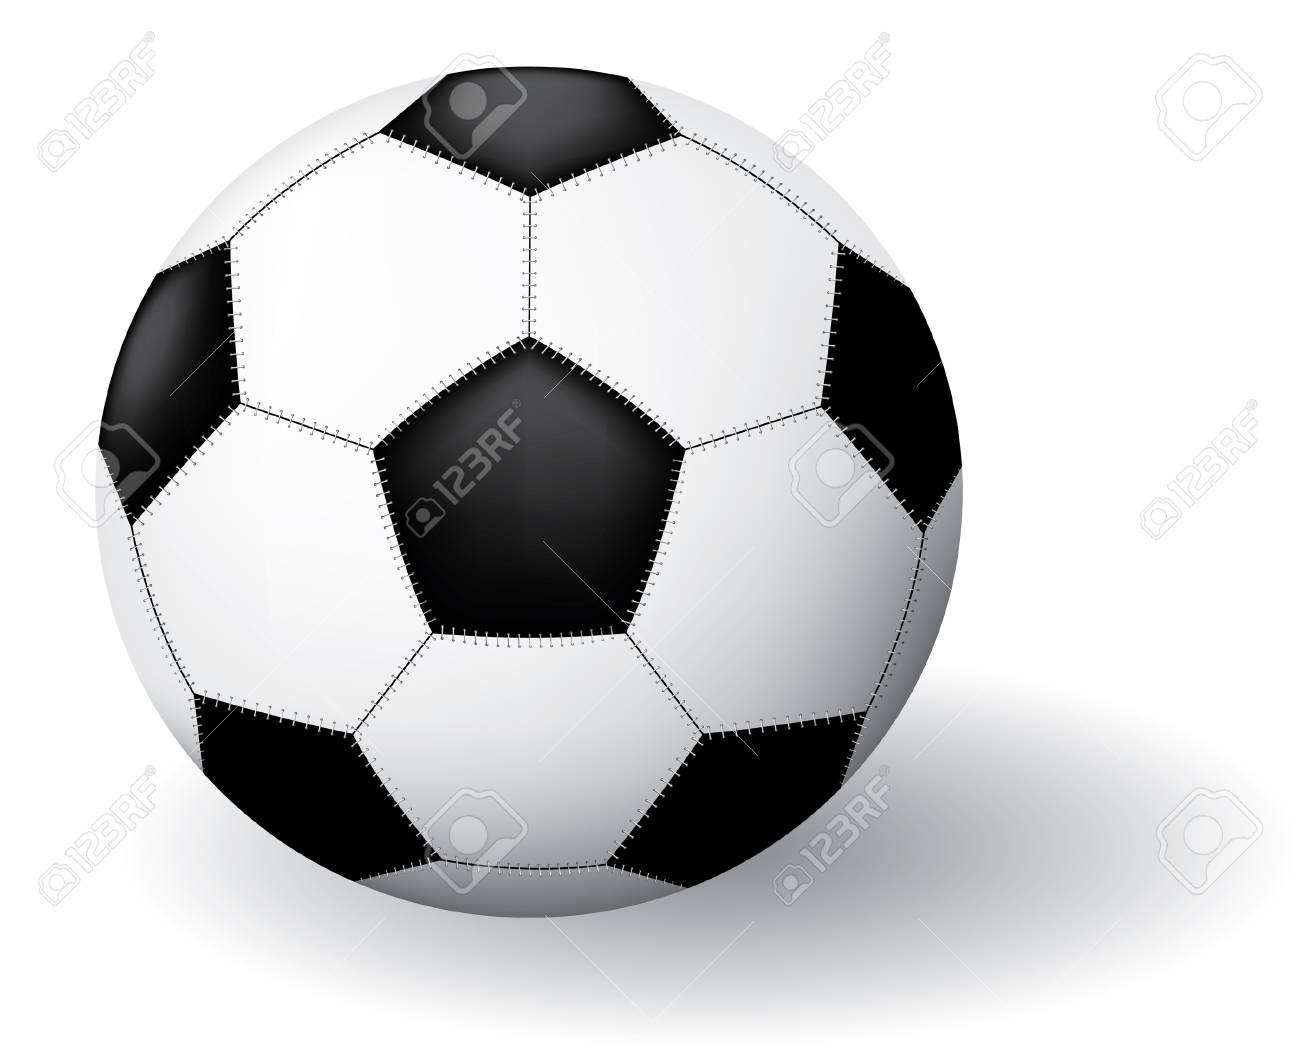 Soccer ball. Vector illustration. Isolated on white background. Stock Vector - 3148365